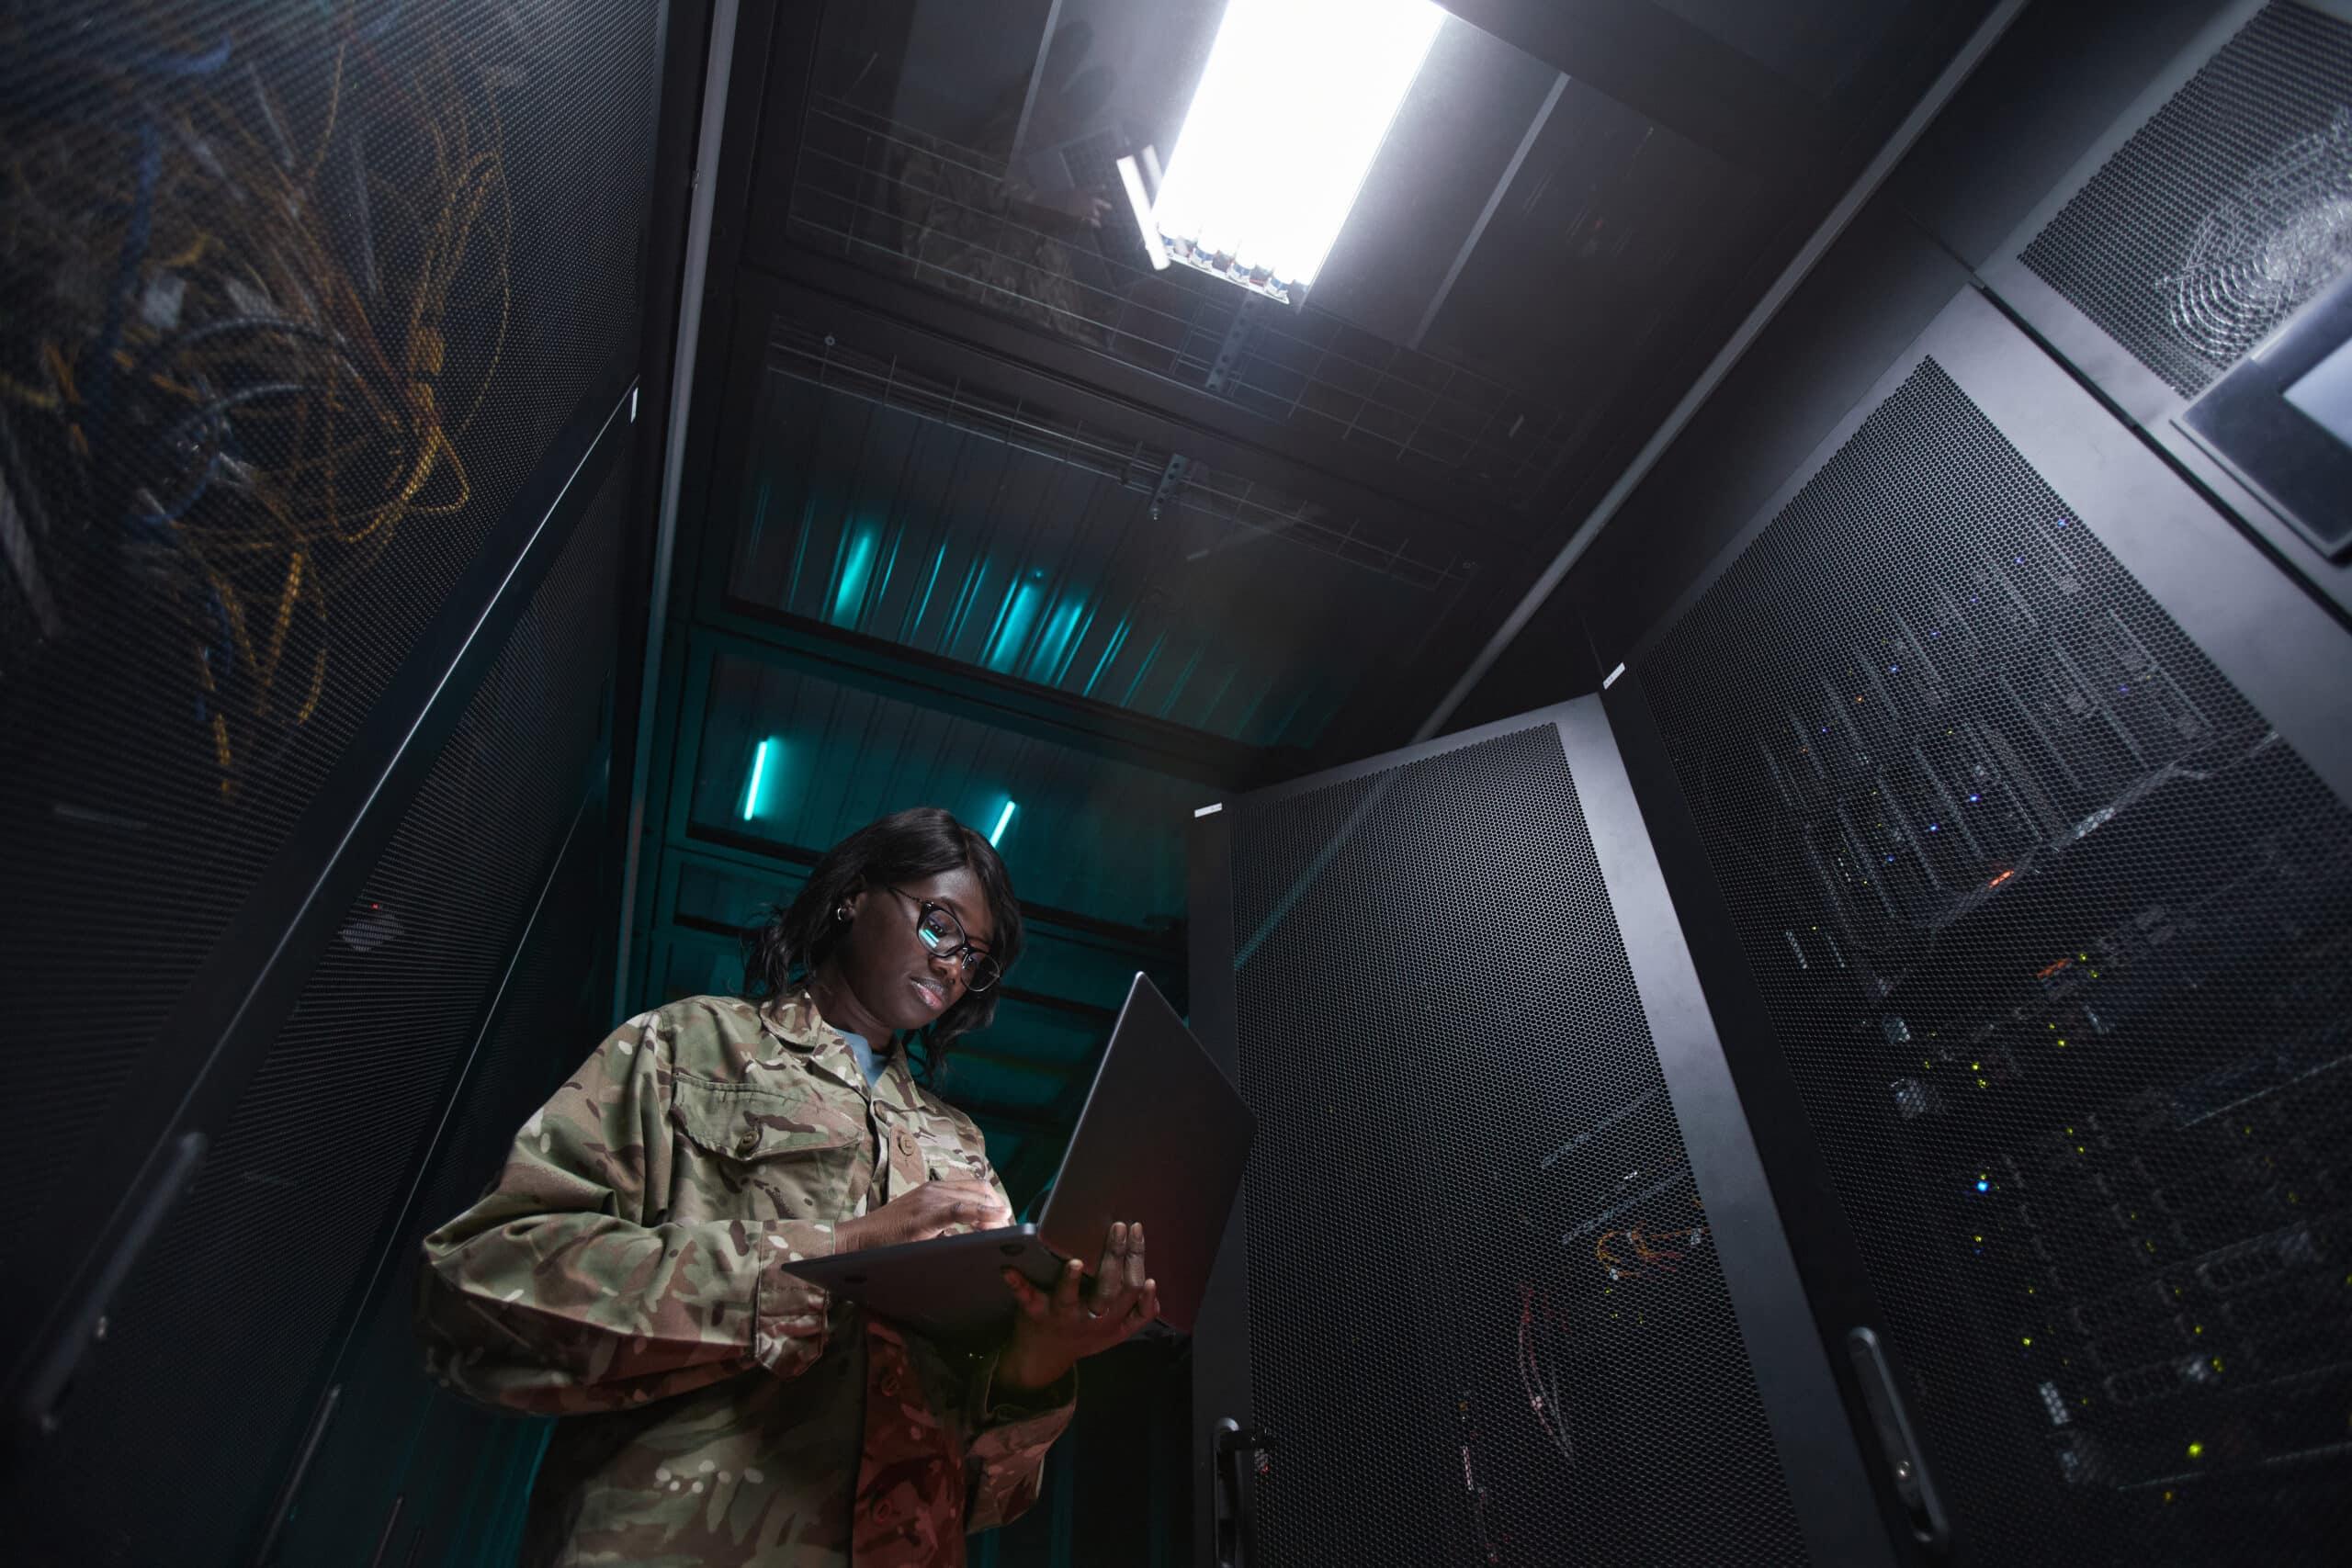 Military Network Technician Inspecting Server